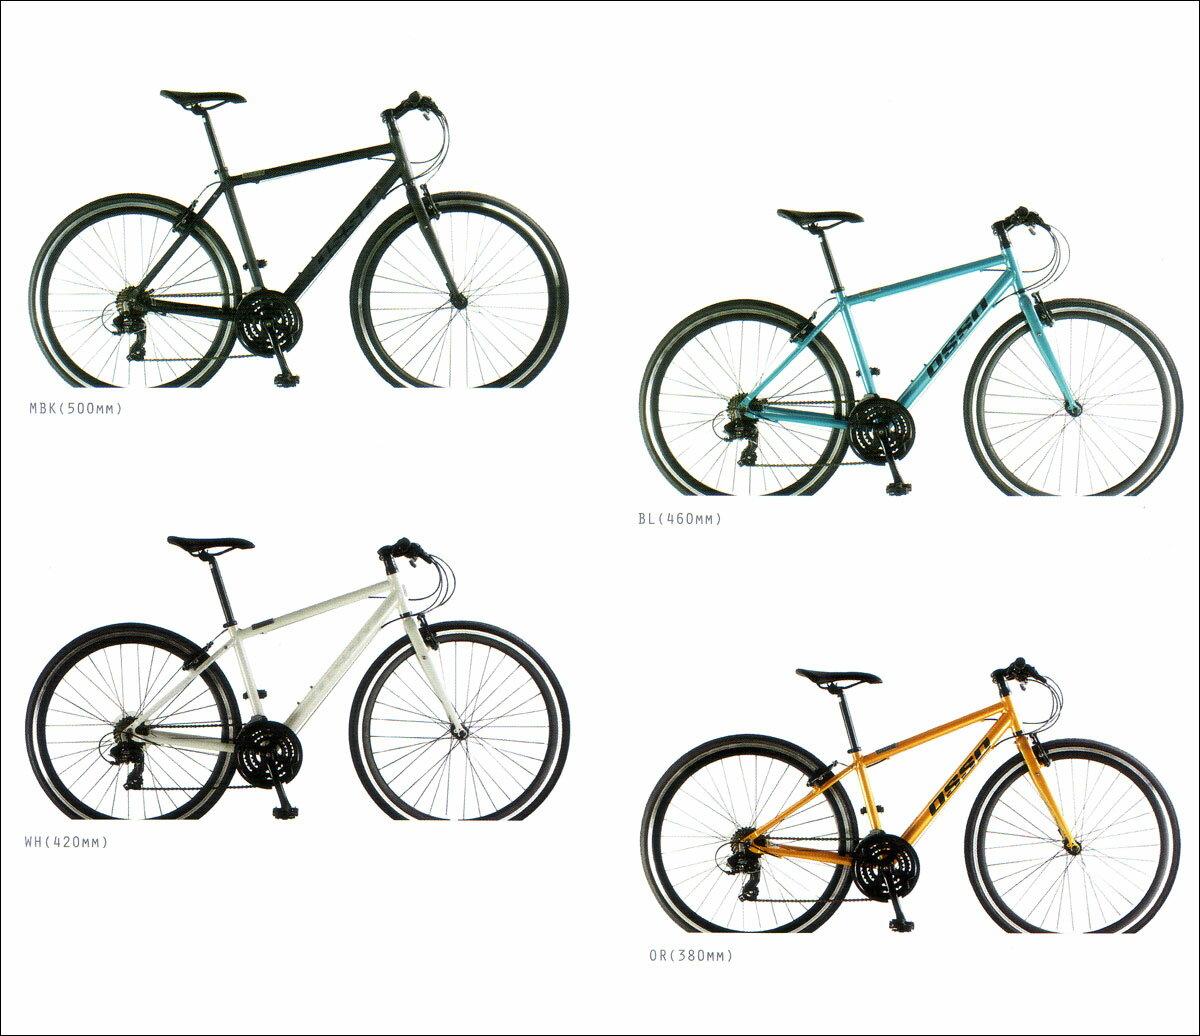 OSSO(オッソ) V330-AL【クロスバイク】【運動/健康/美容】 OSSO(オッソ) V330-AL【クロスバイク】忙しい